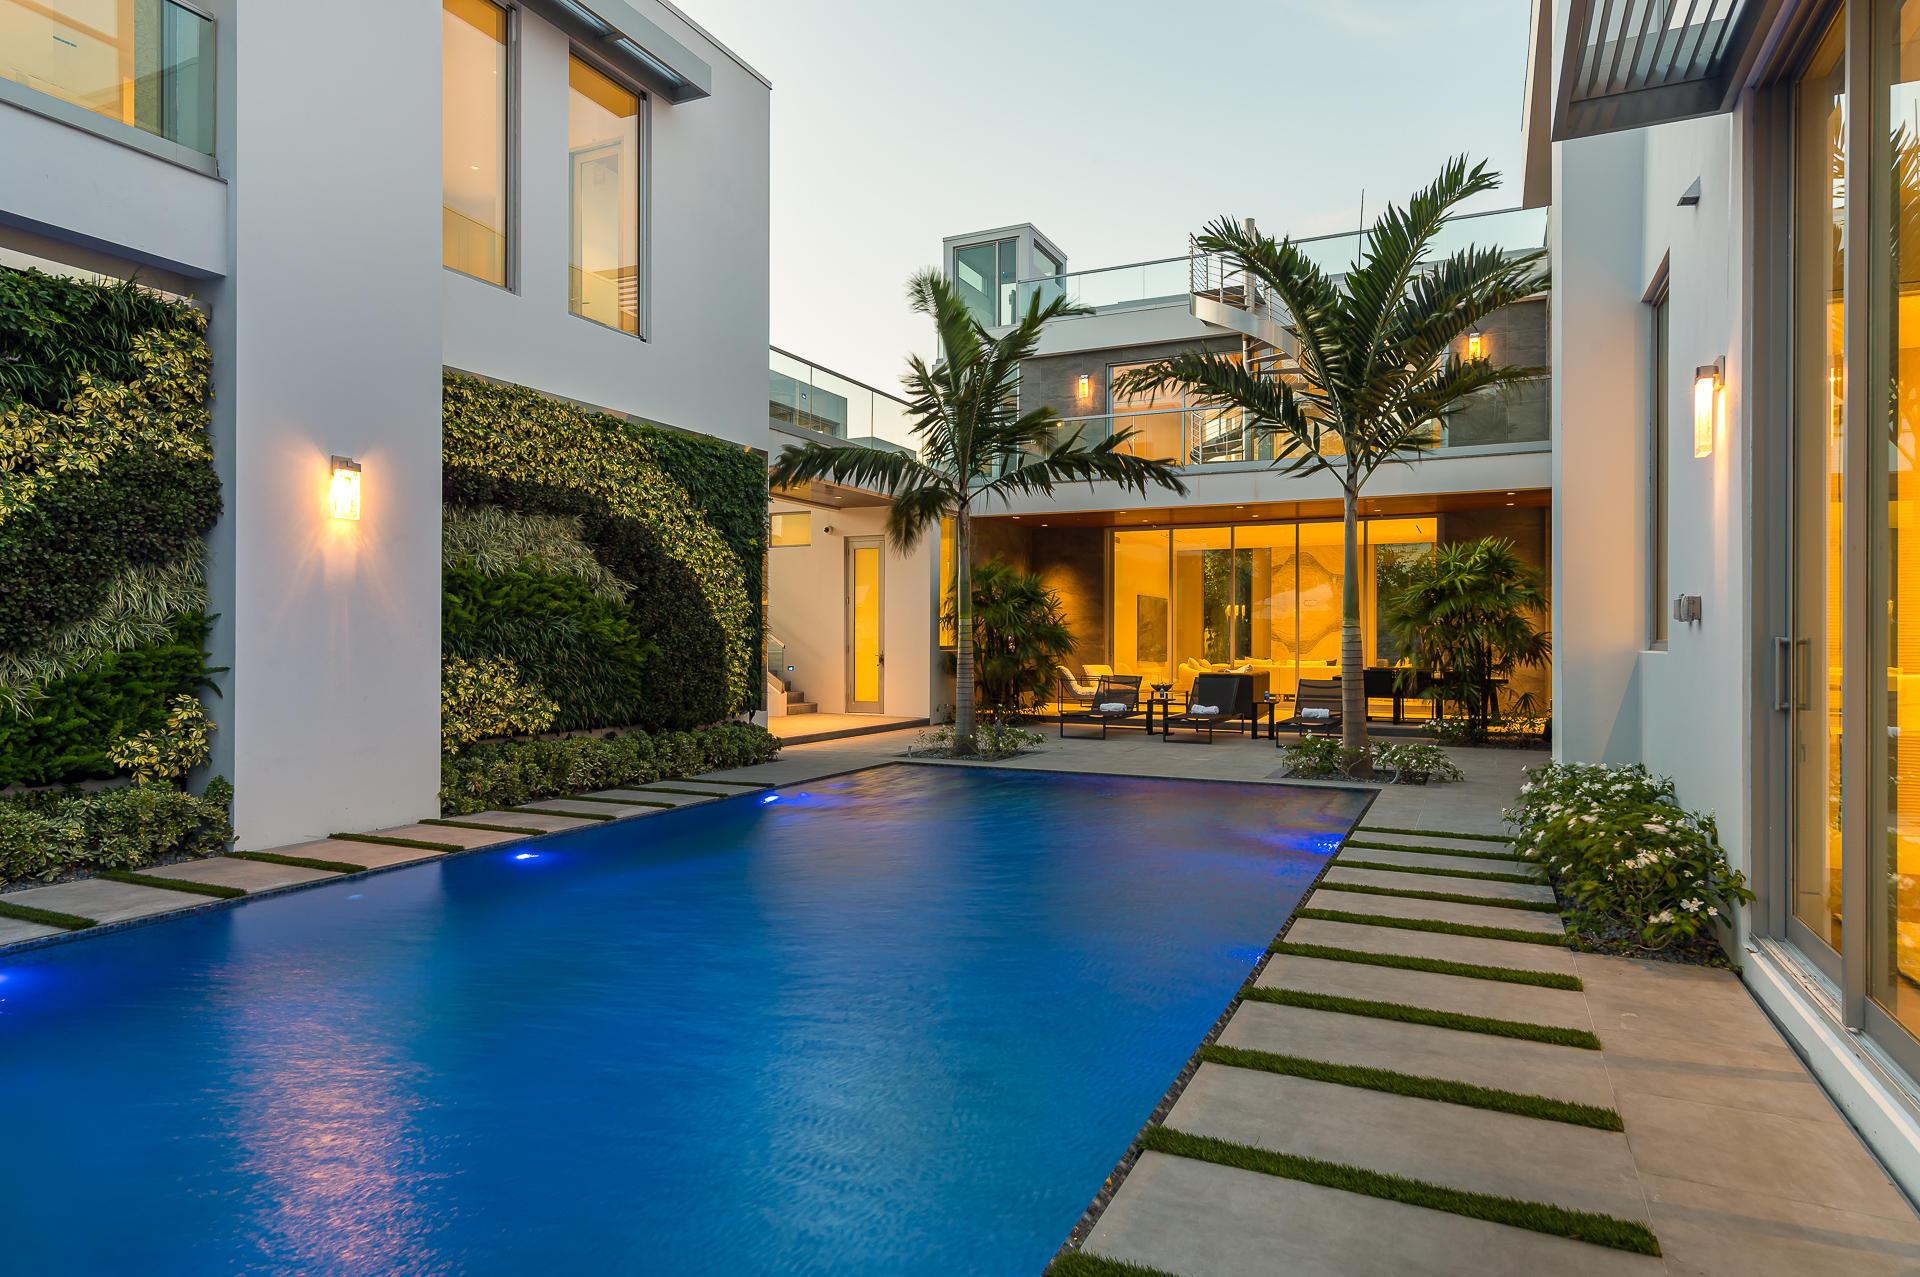 Living Wall and Infinity Pool